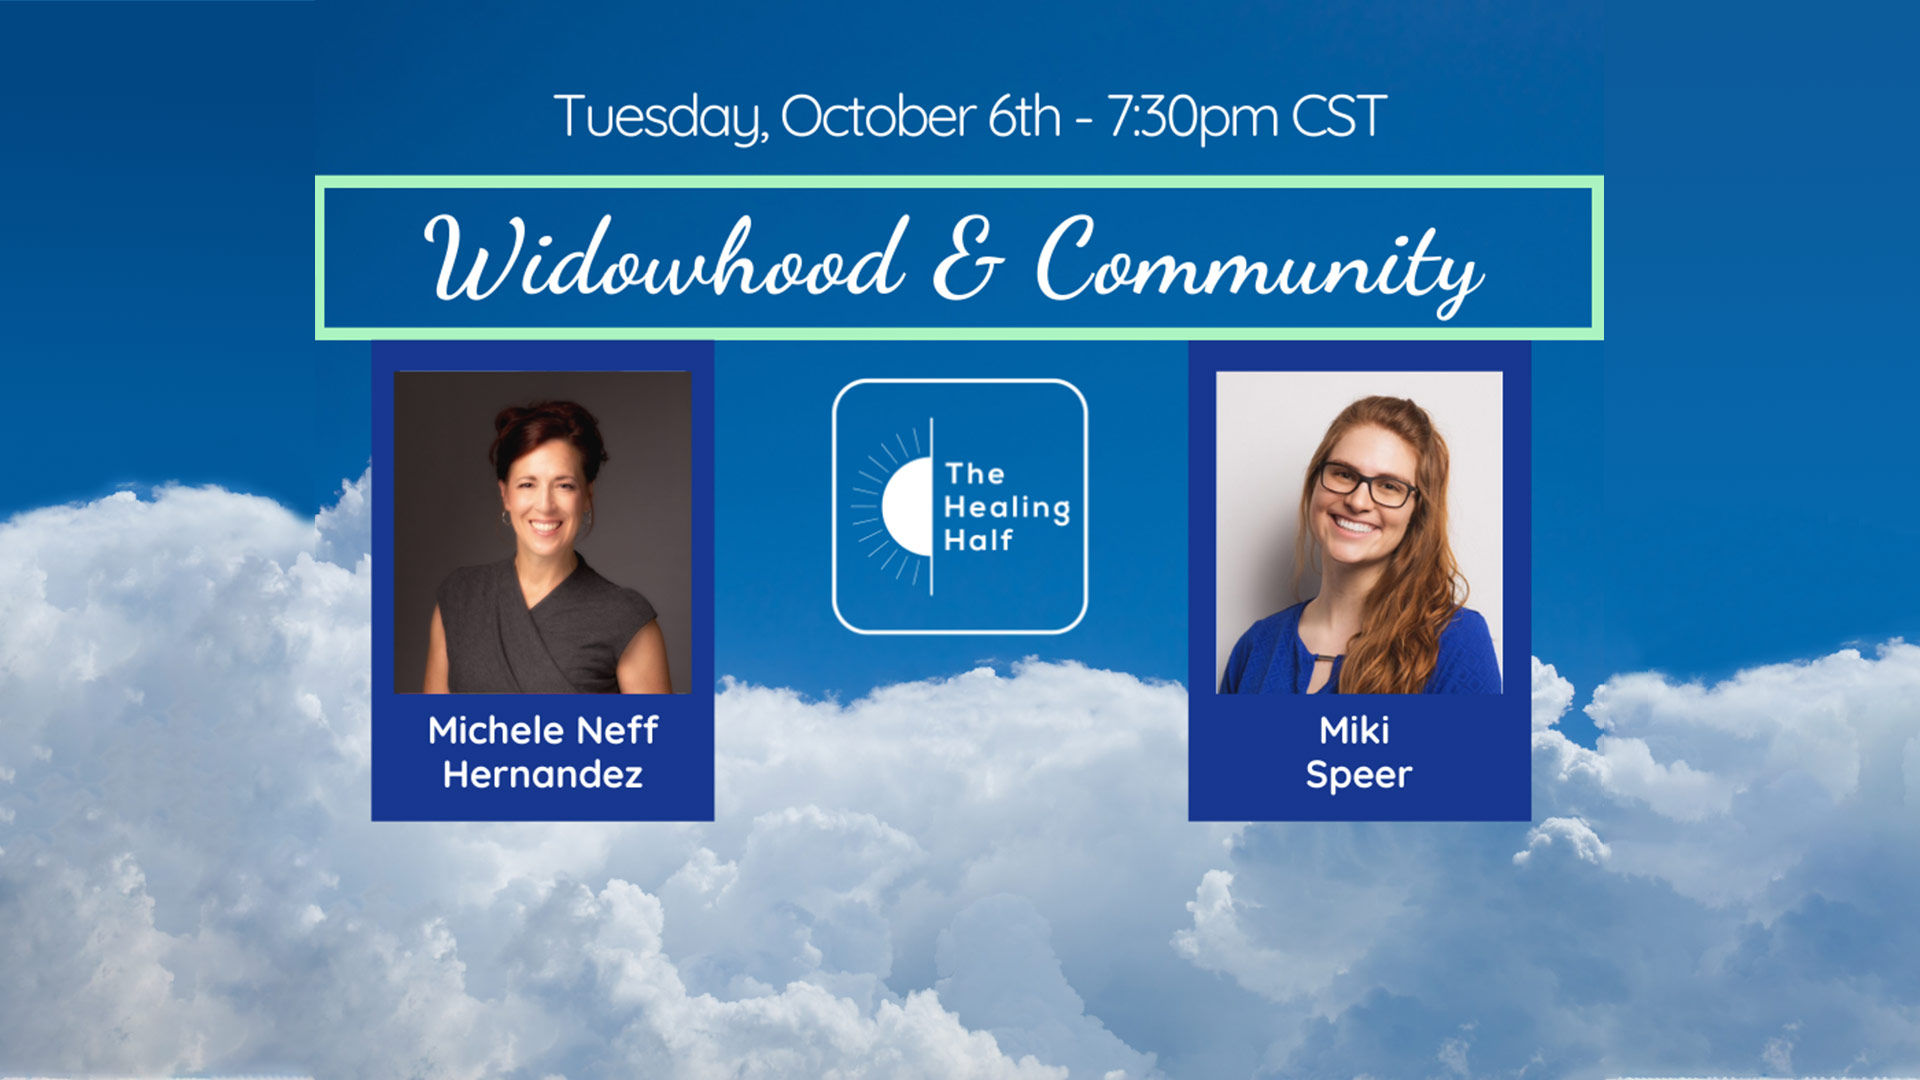 Widowhood and Community